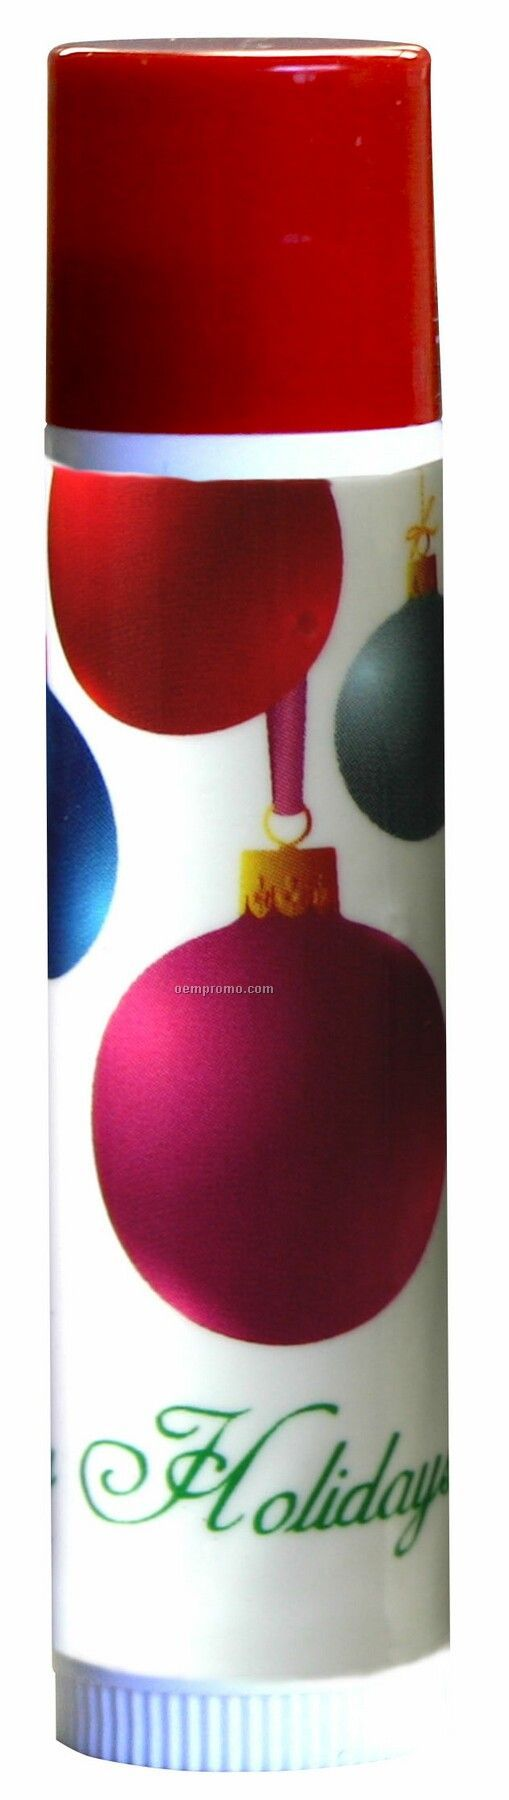 Cherry Flavor Spf15 Lip Balm W/Standard Red Cap